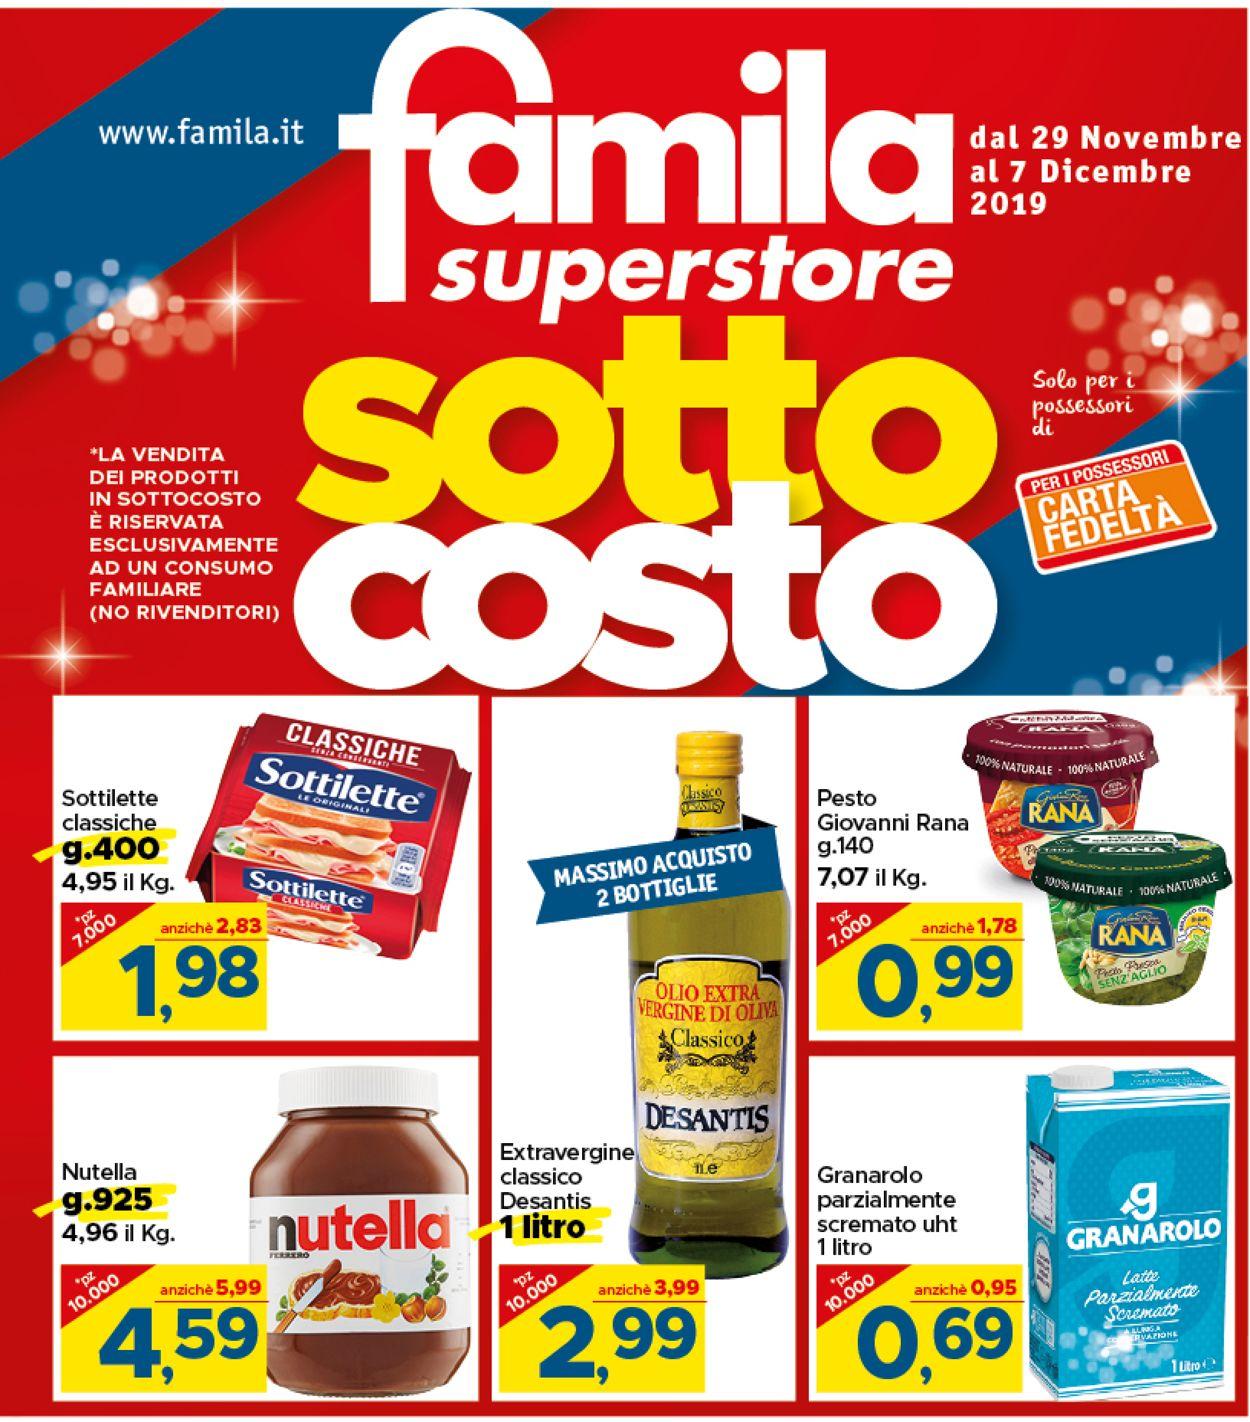 Volantino Famila - BLACK WEEKEND 2019 - Offerte 29/11-07/12/2019